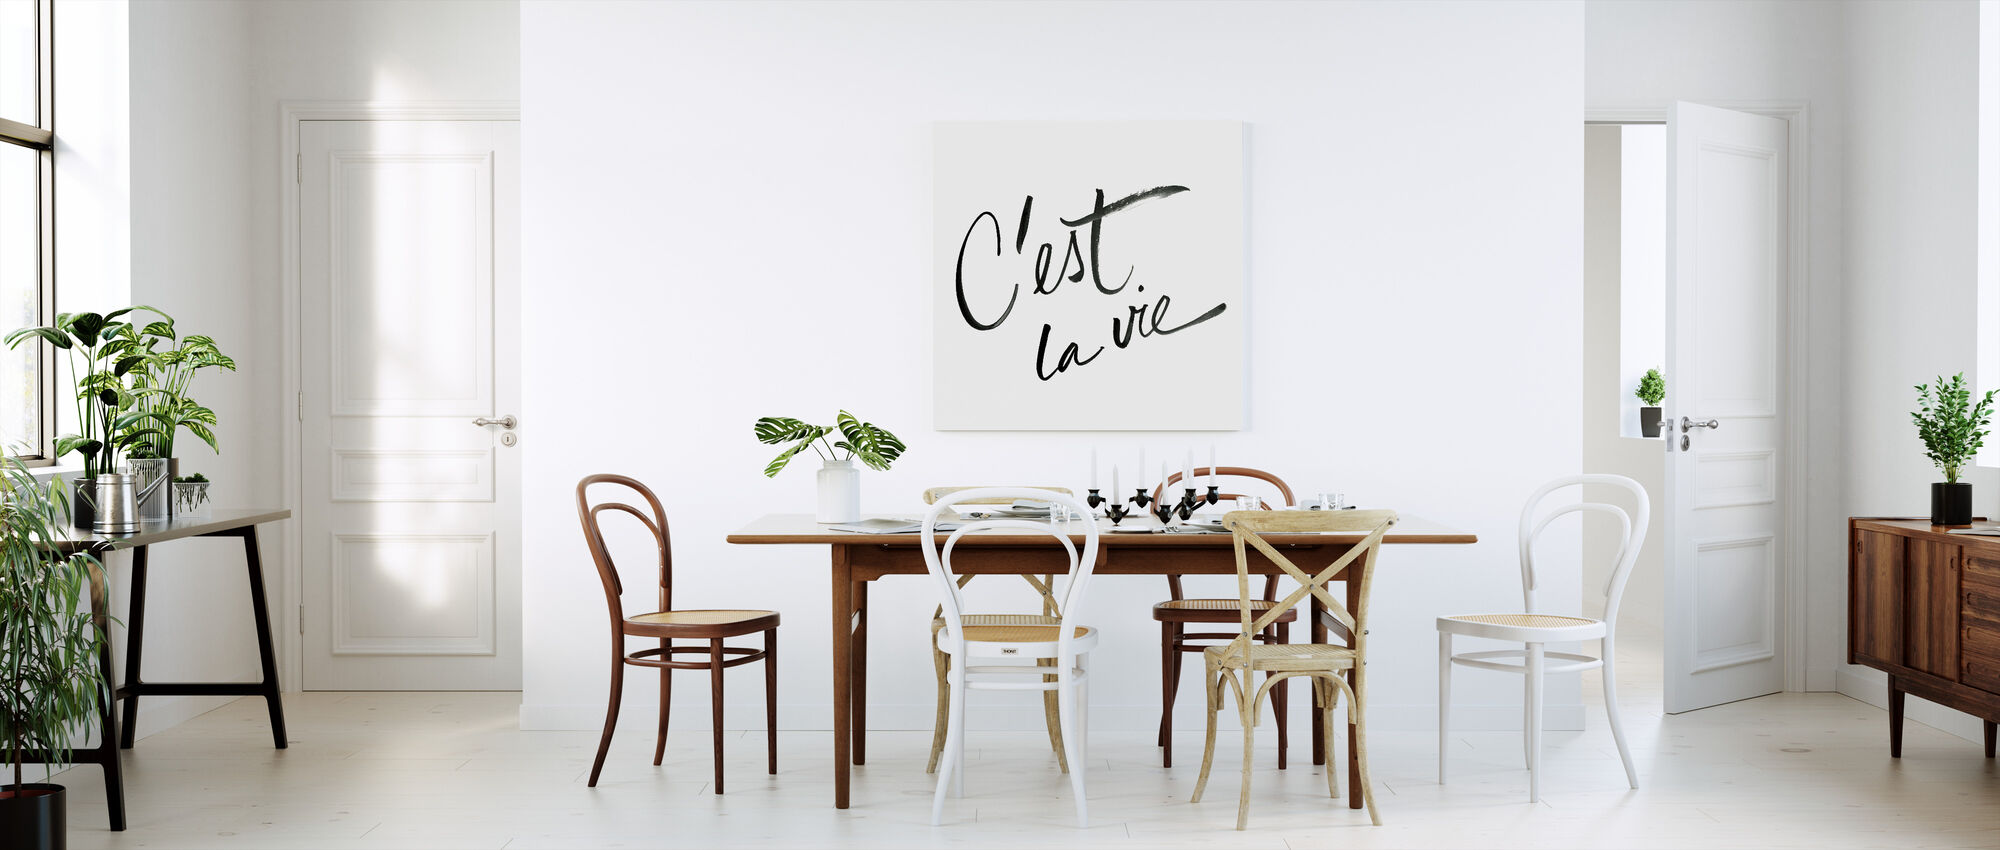 It's Life - Canvas print - Kitchen